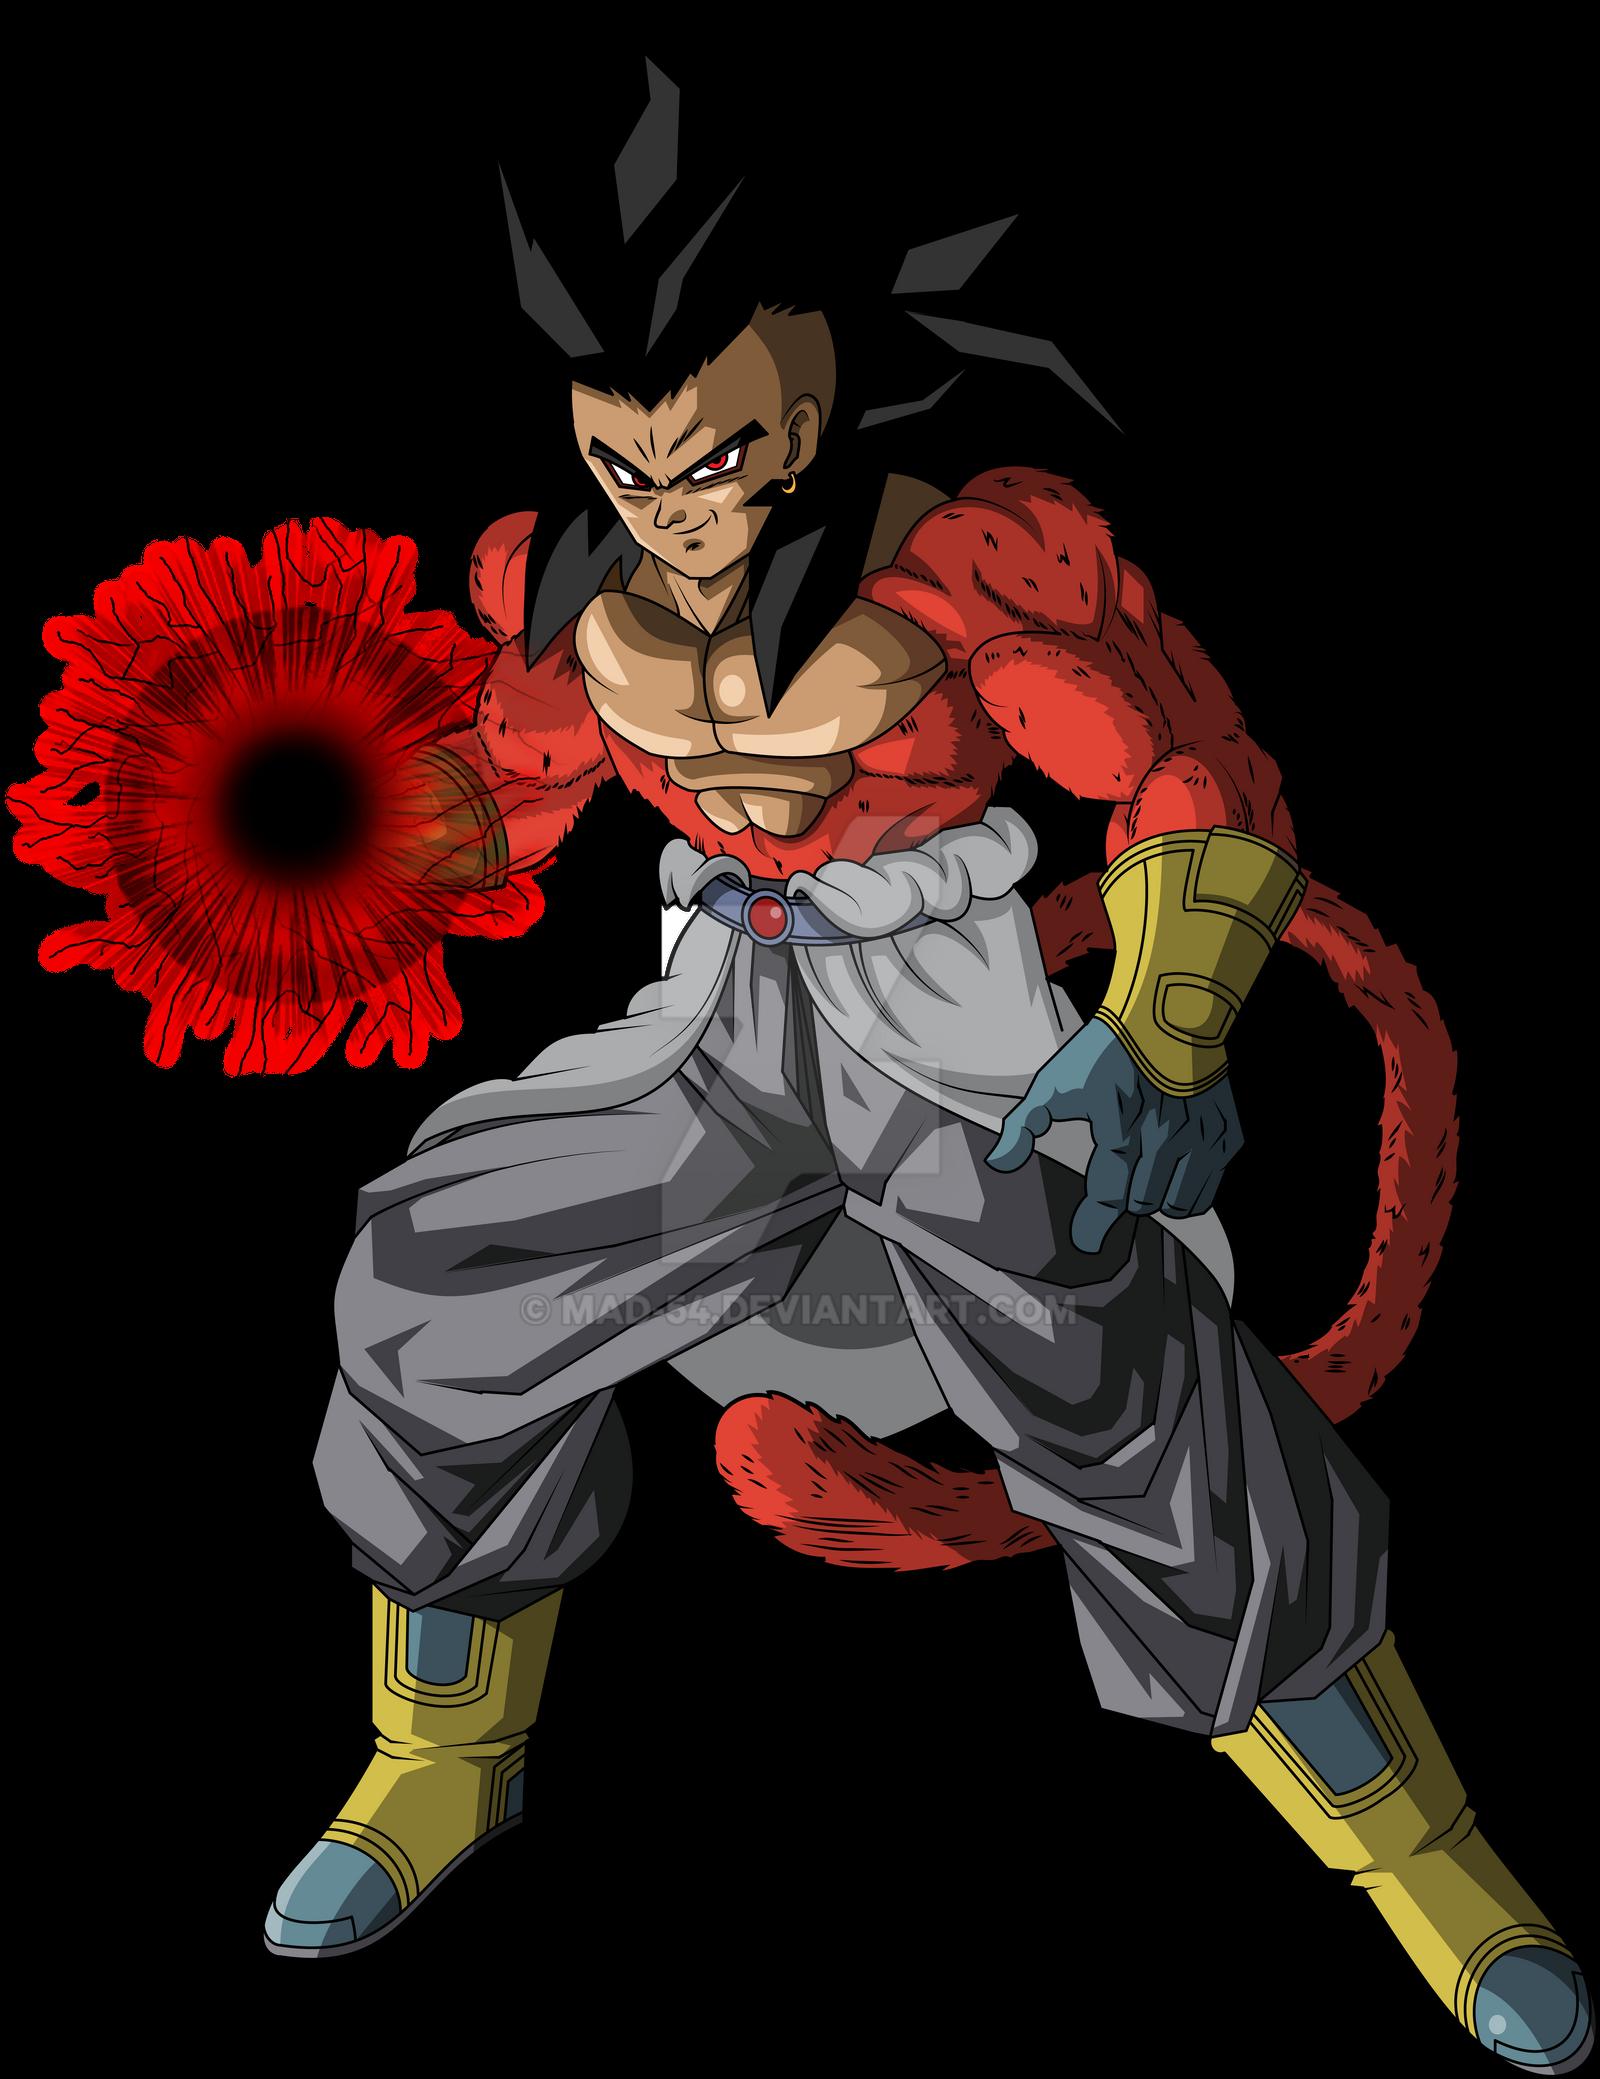 (Super Saiyan Beast) Maduka by MAD-54 on DeviantArt